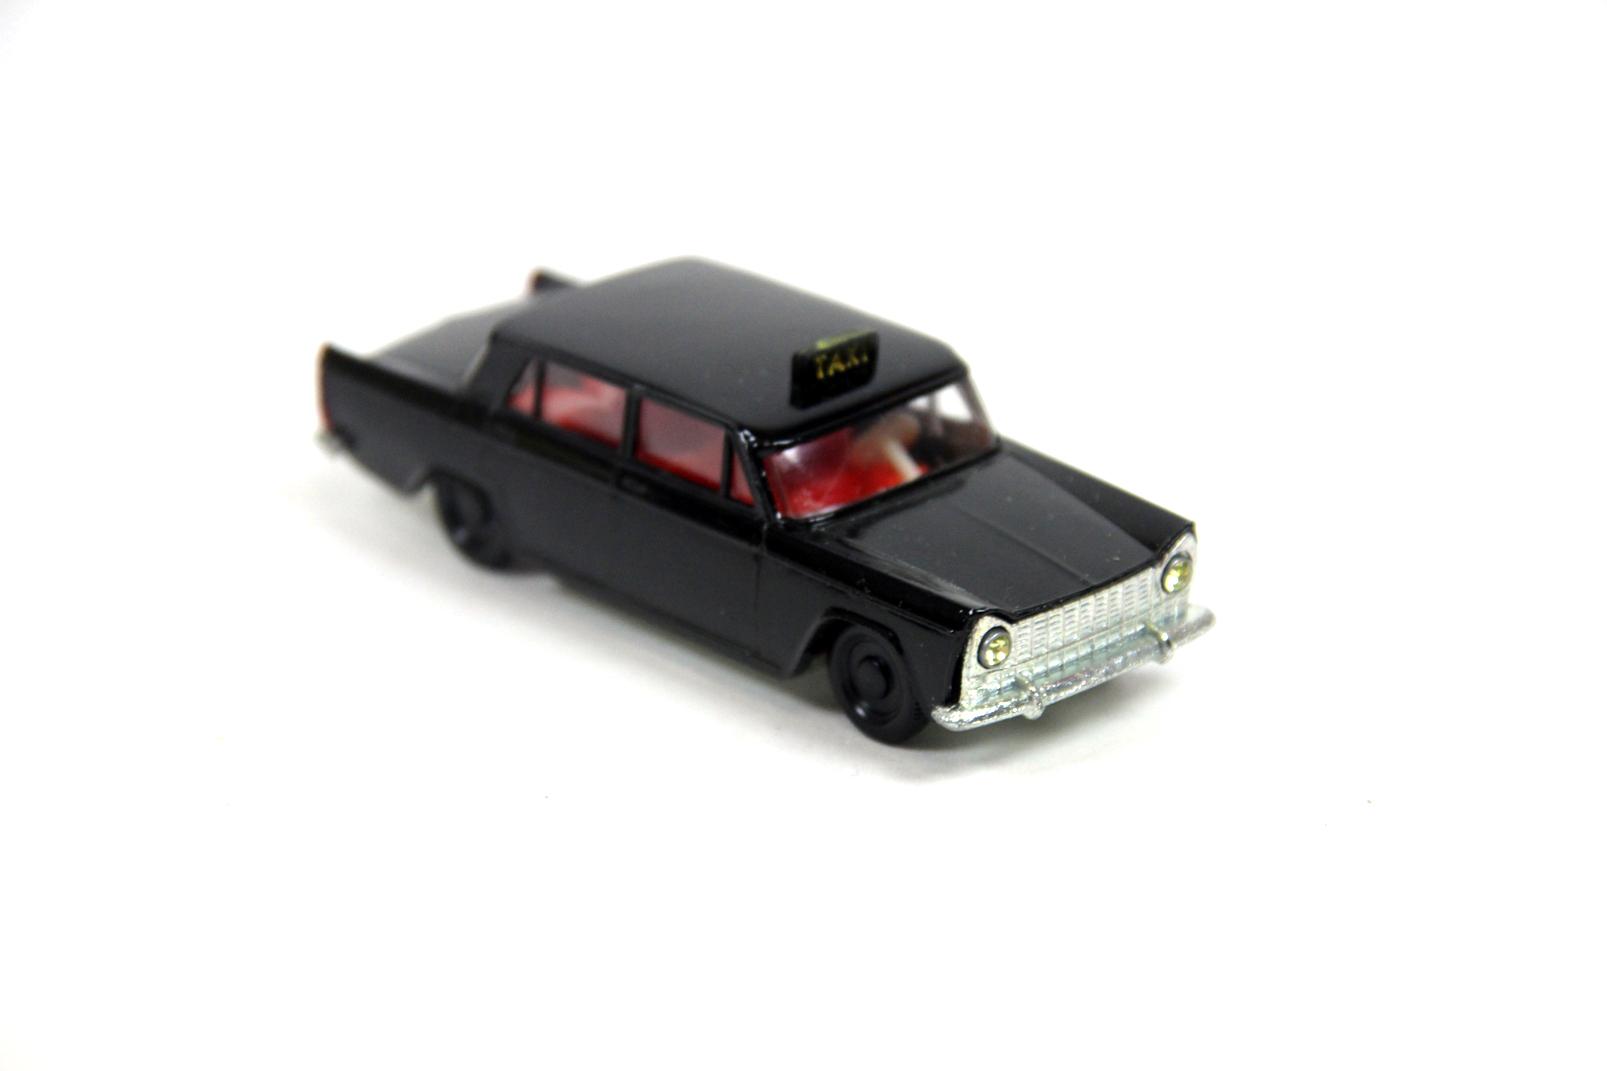 siku super serie v 244 fiat 1800 taxi modellauto zink guss auto kfz schwarz ovp ebay. Black Bedroom Furniture Sets. Home Design Ideas